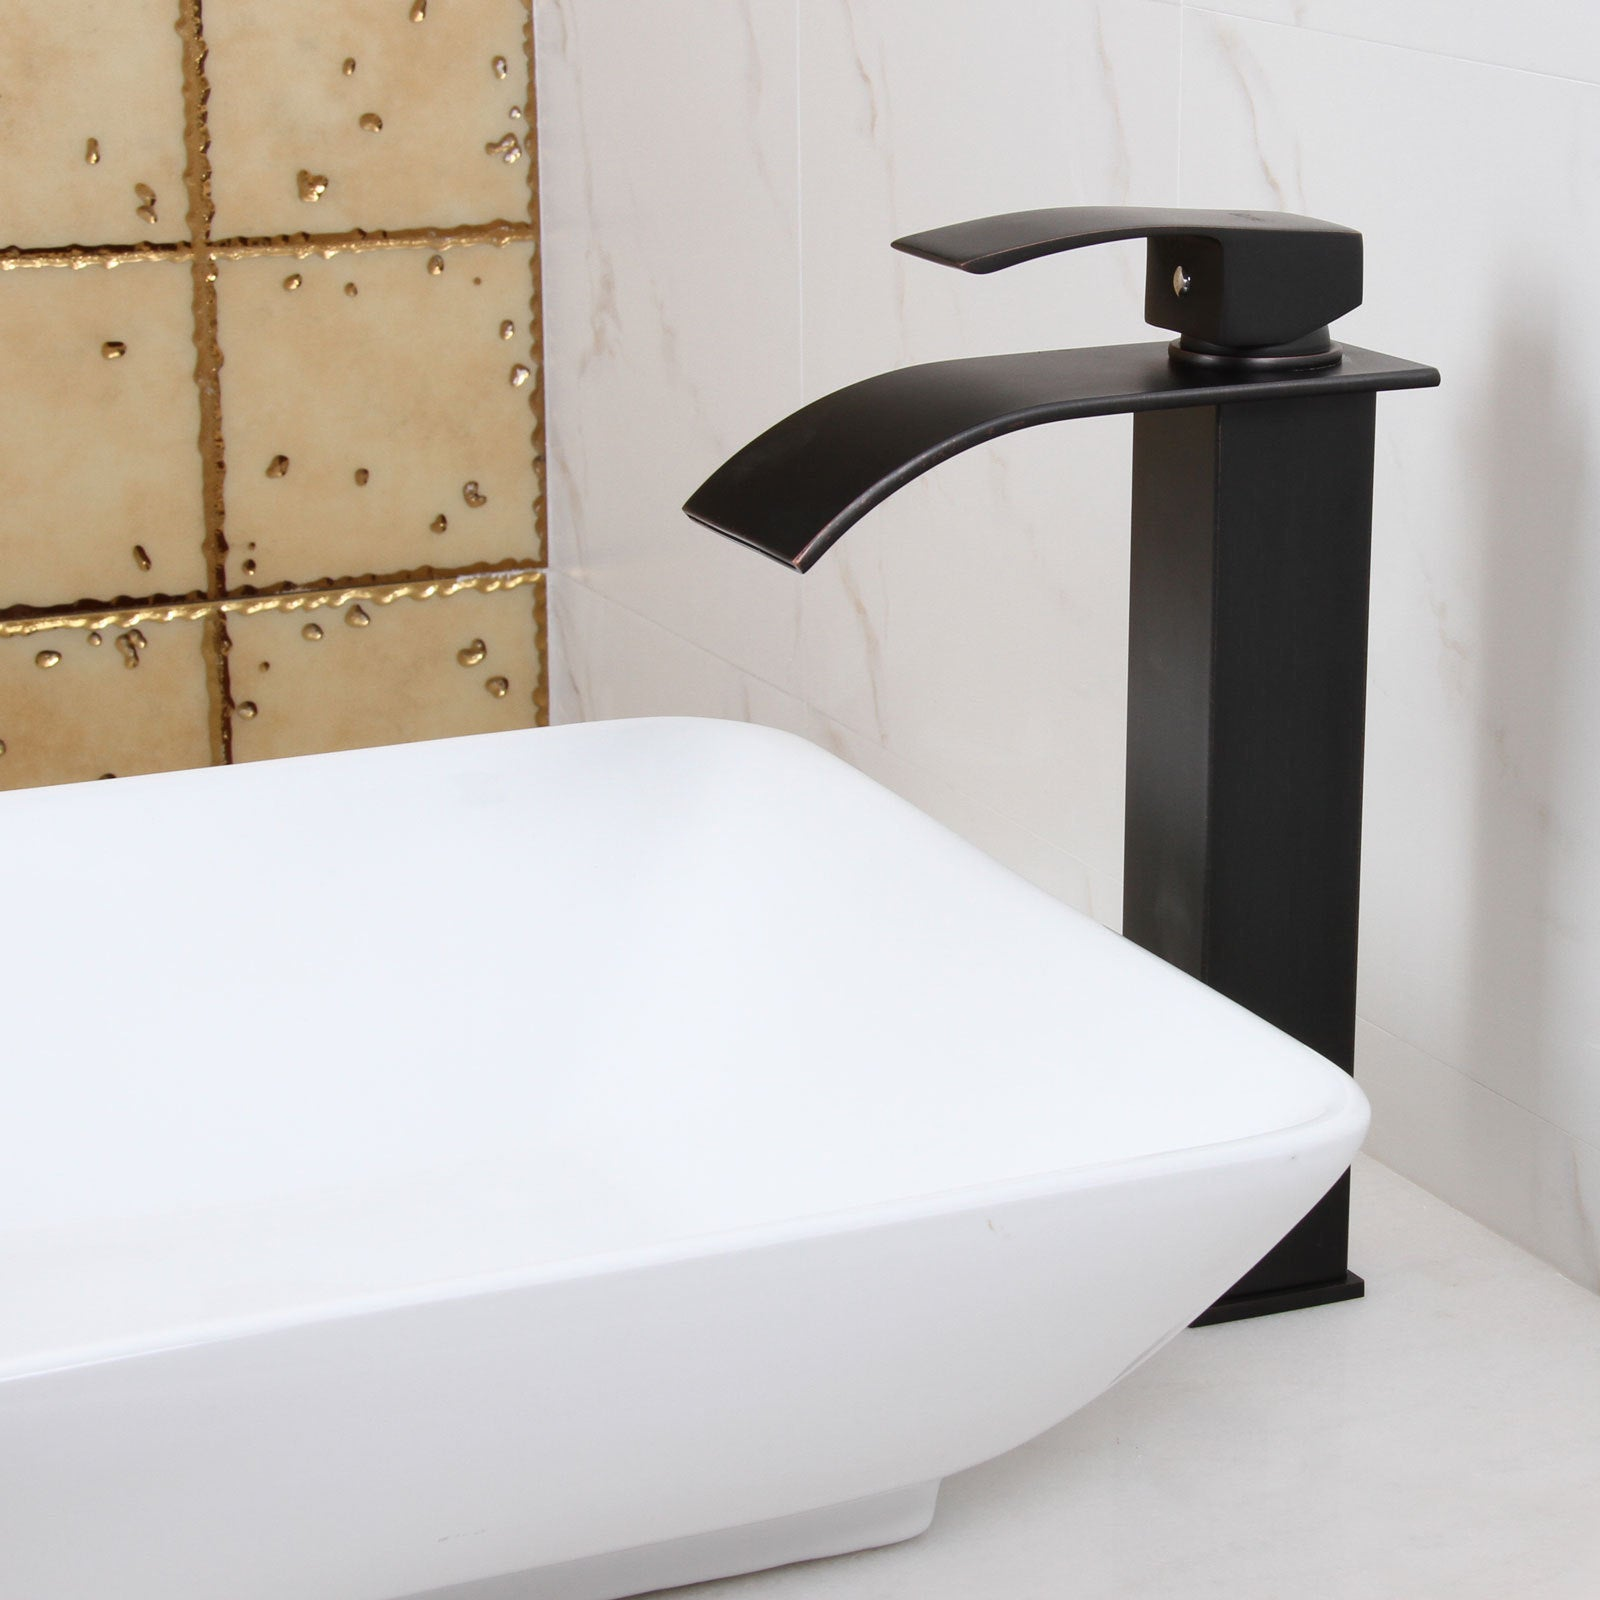 Ordinaire Shop Elite 8804 Single Handle Lever Bathroom Lavatory Faucet   Free  Shipping Today   Overstock.com   13005634